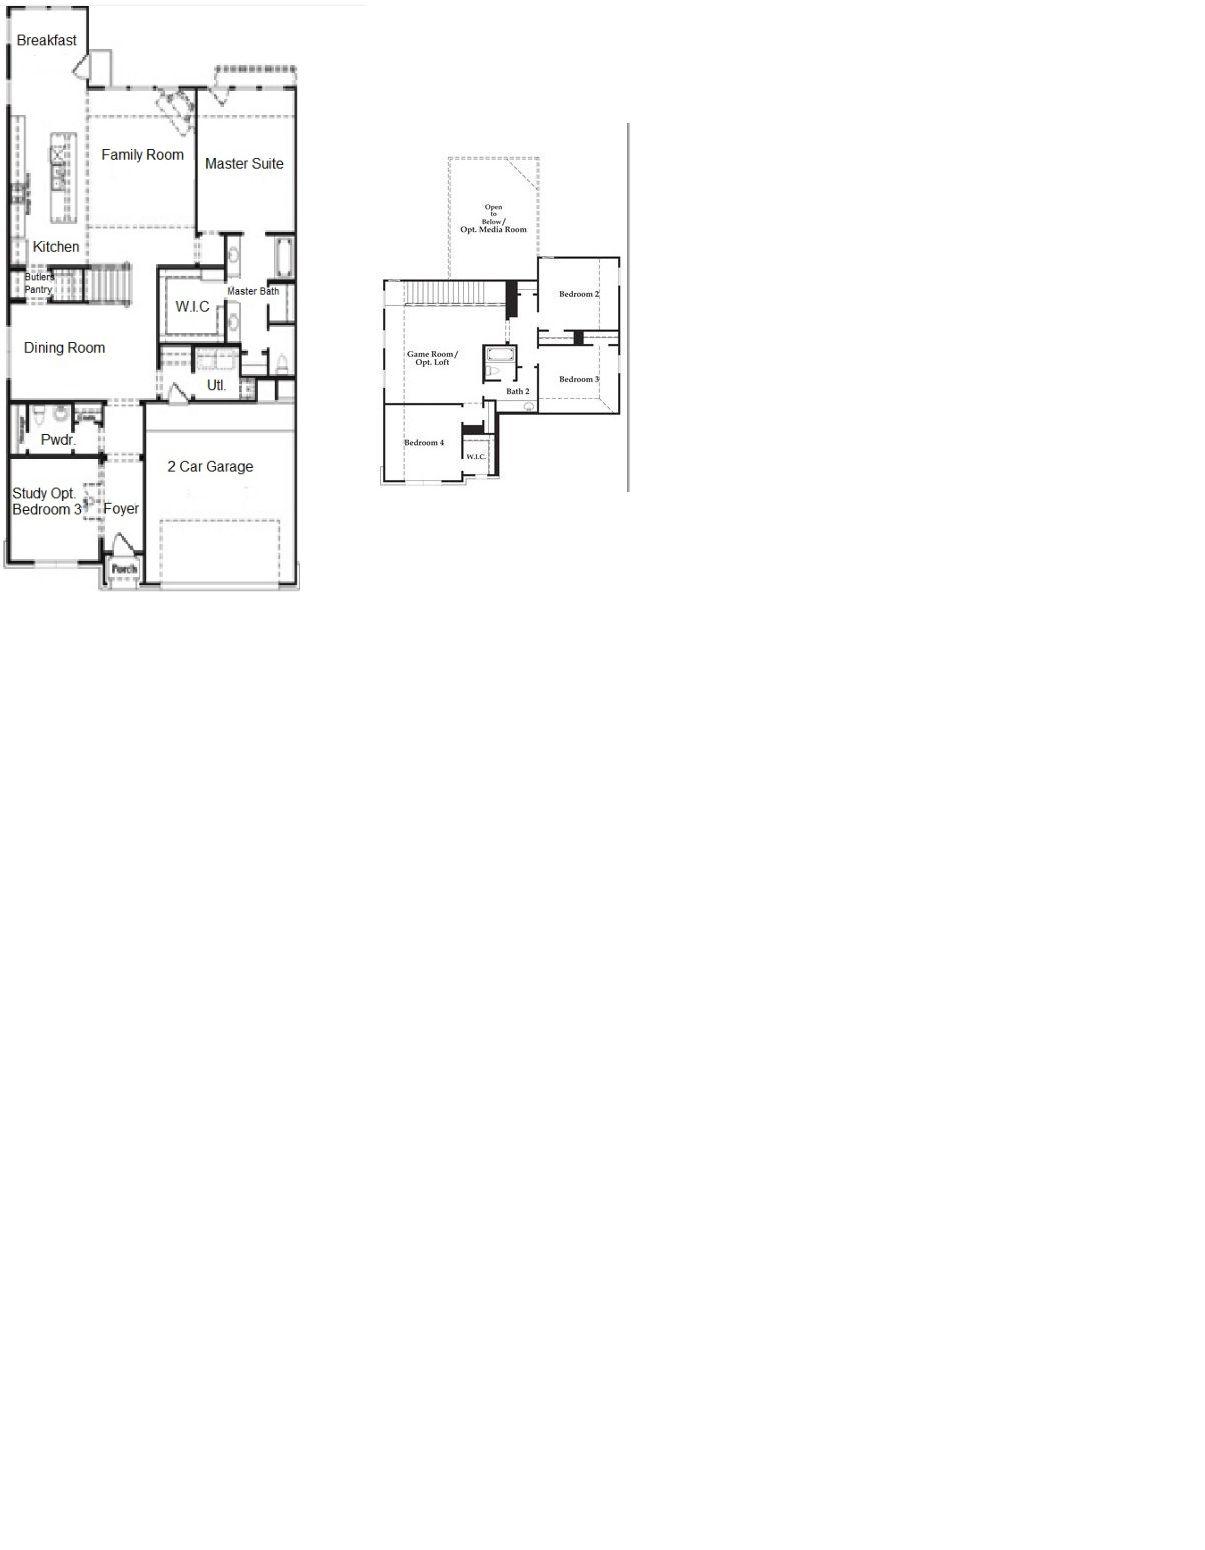 Westlake Ashton Wood Floor Plans Floor Plans How To Plan West Lake